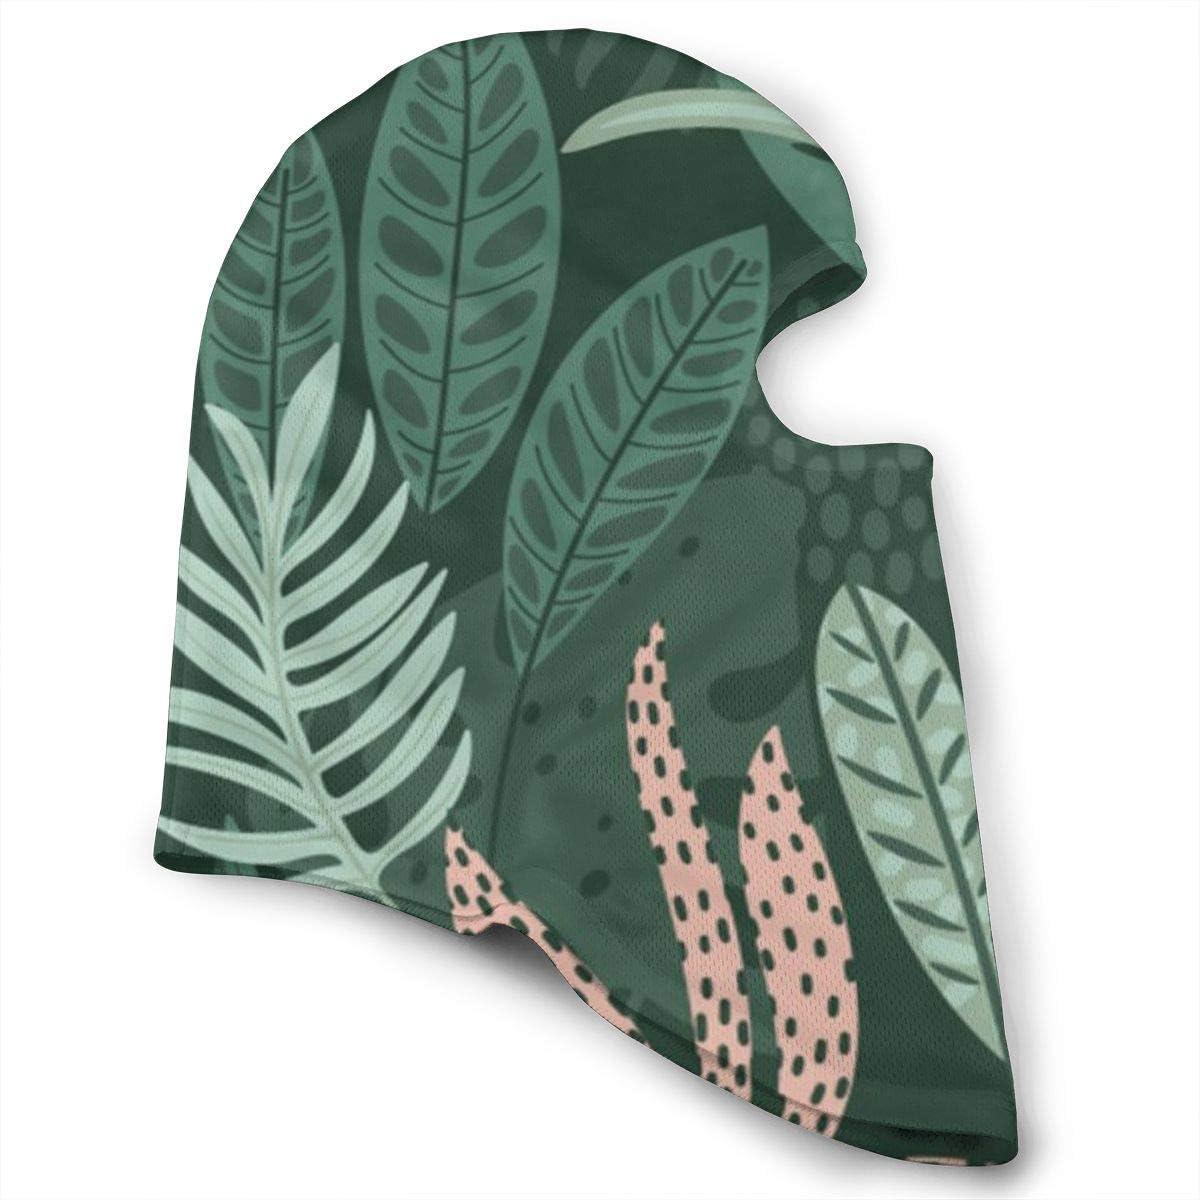 CAClifestyle Tropical Leaves Pattern Unisex Windproof Balaclavas Full Face Mask Hood